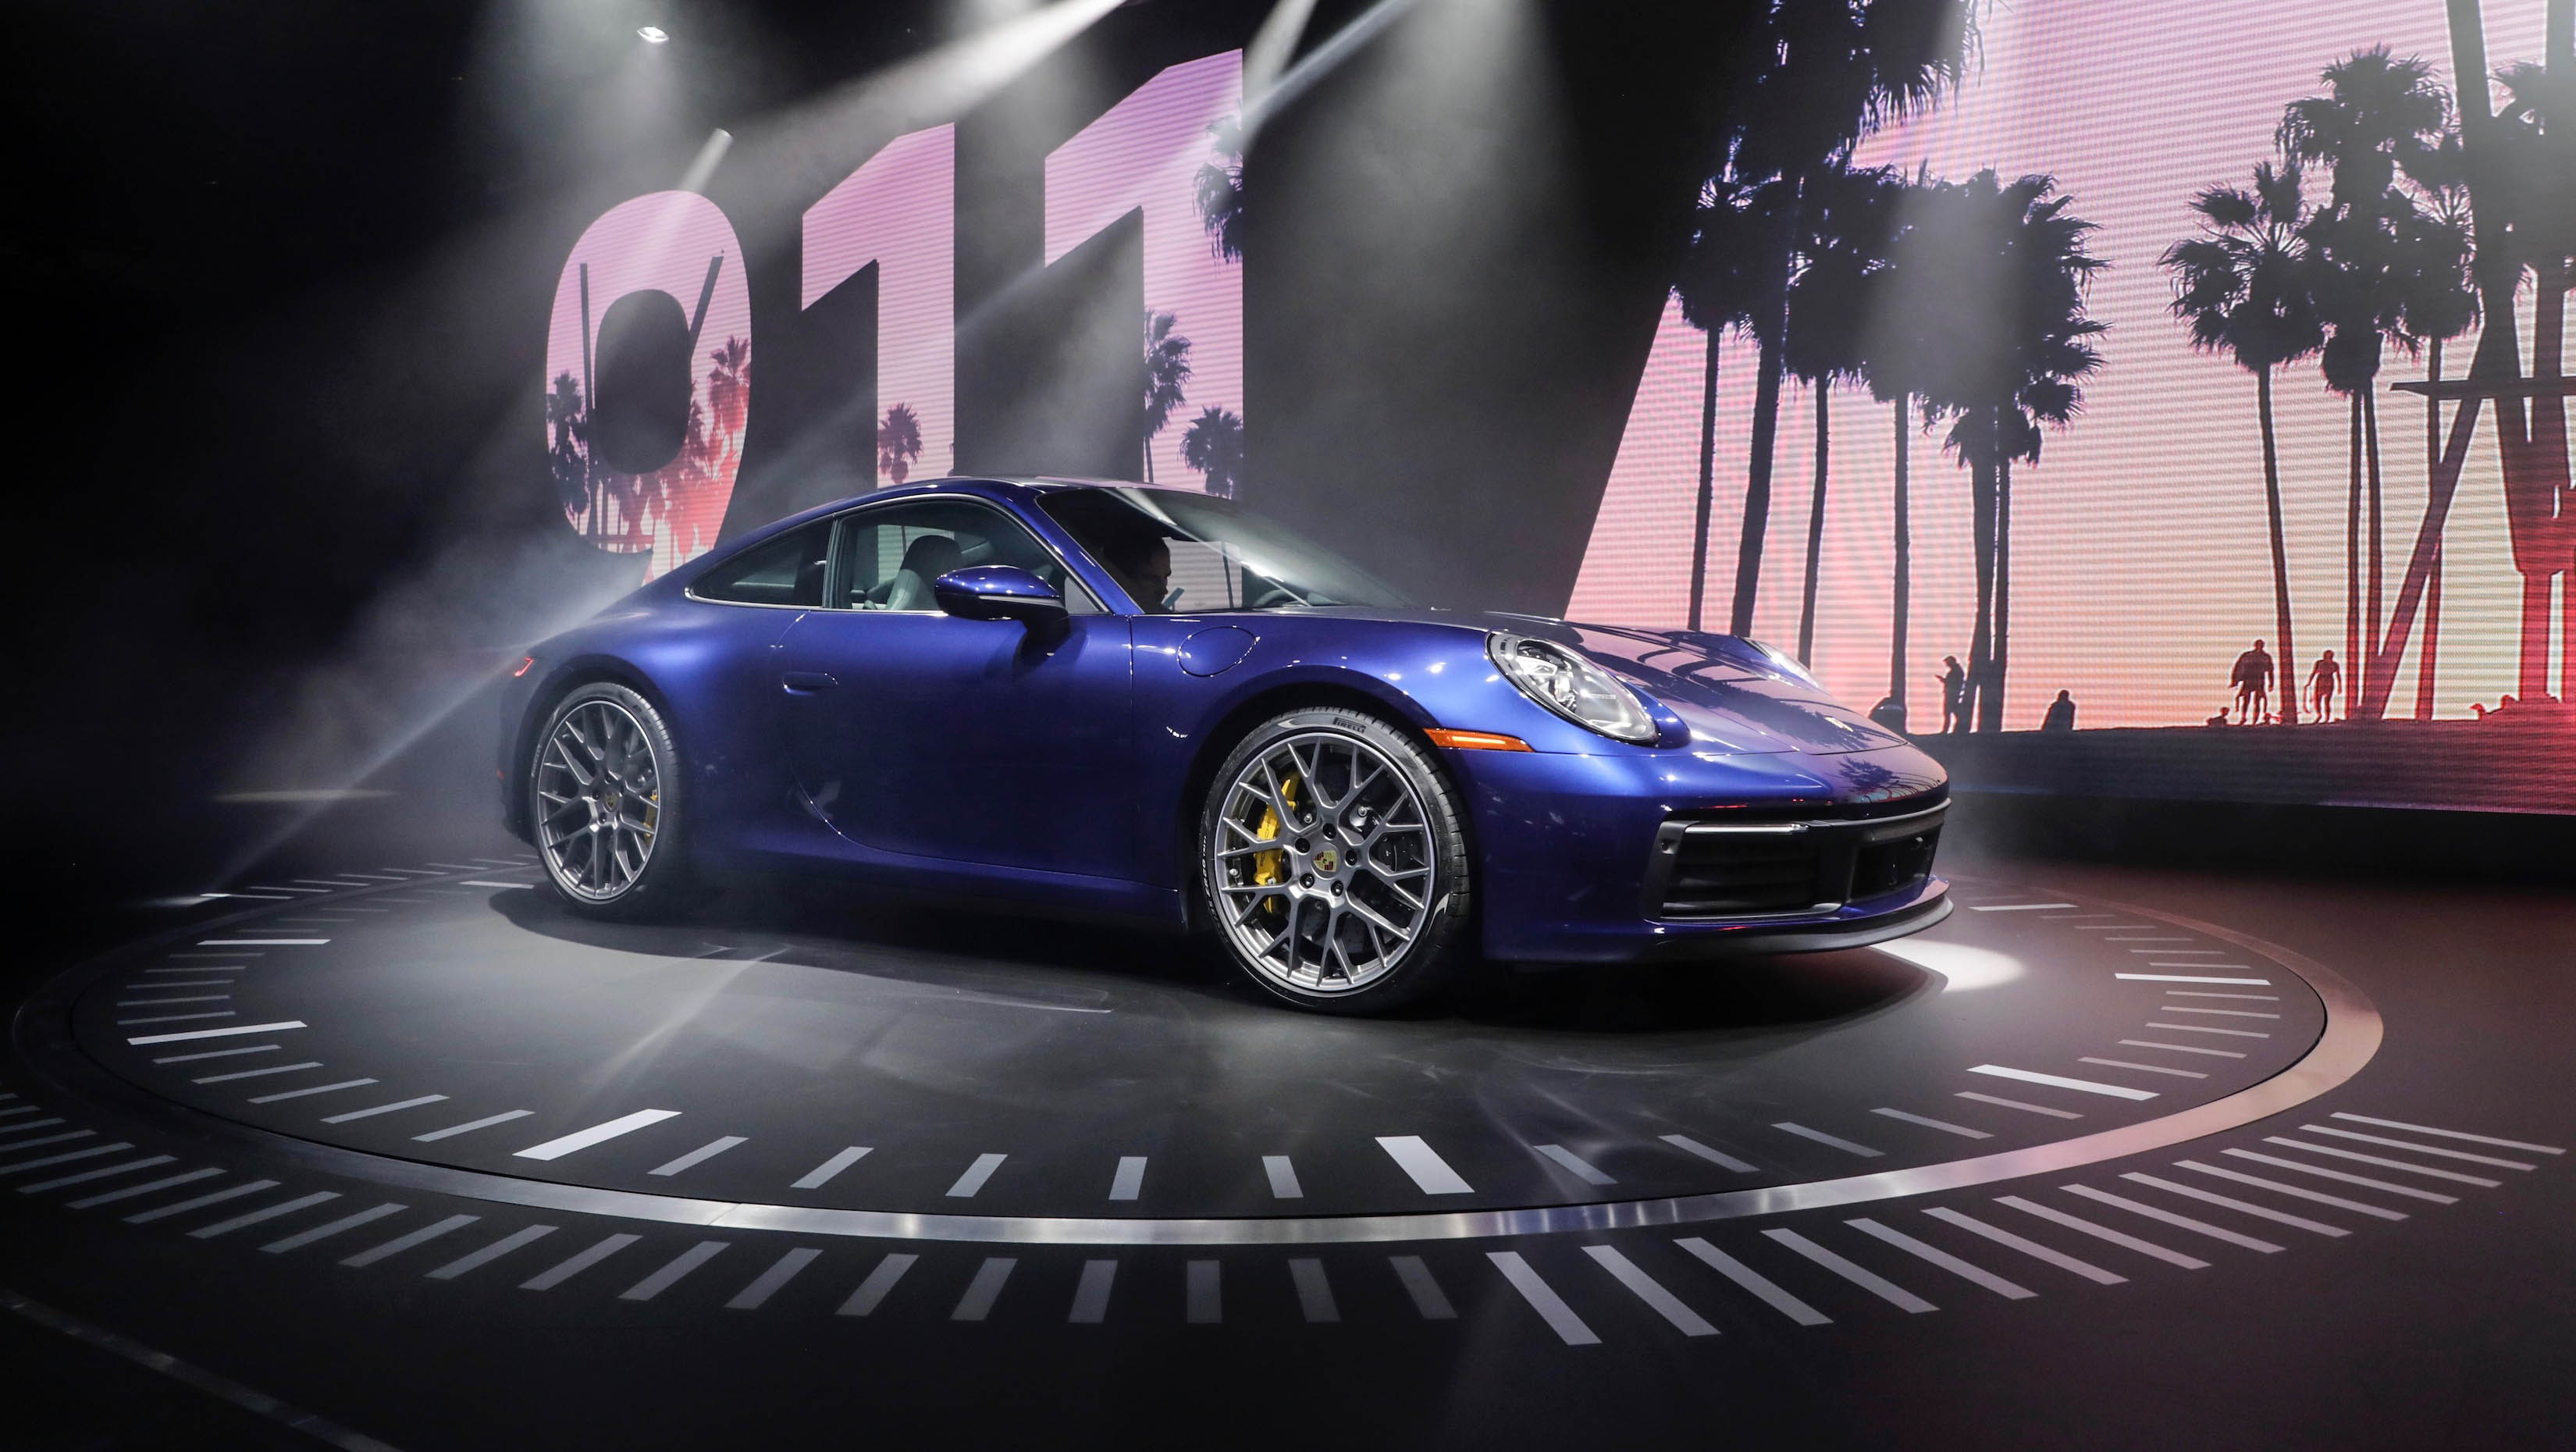 Porsche 911, This Is Your Life | Calibre Magazine